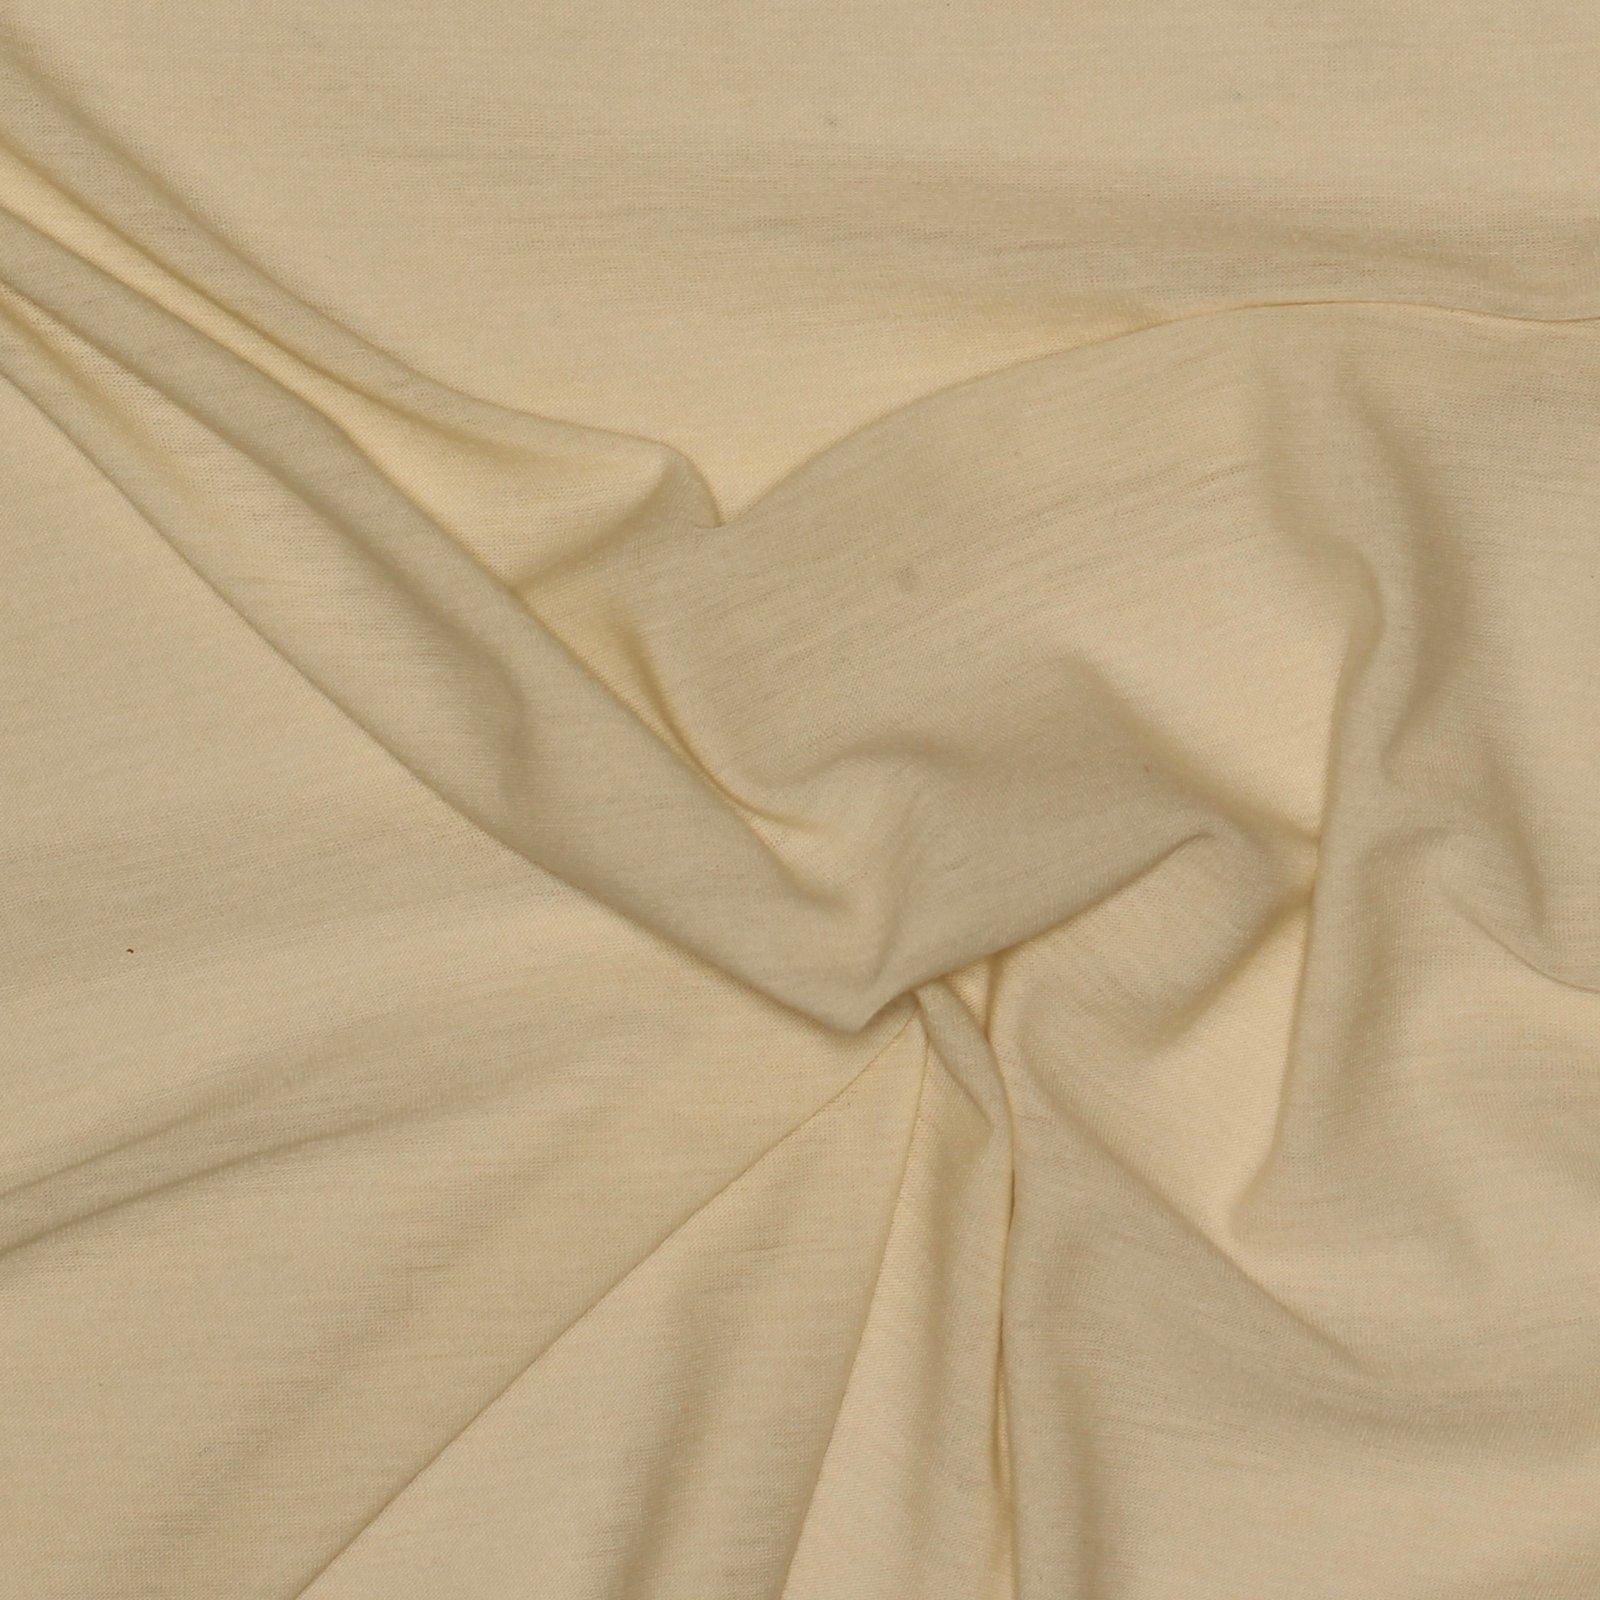 Winter White Wool Jersey